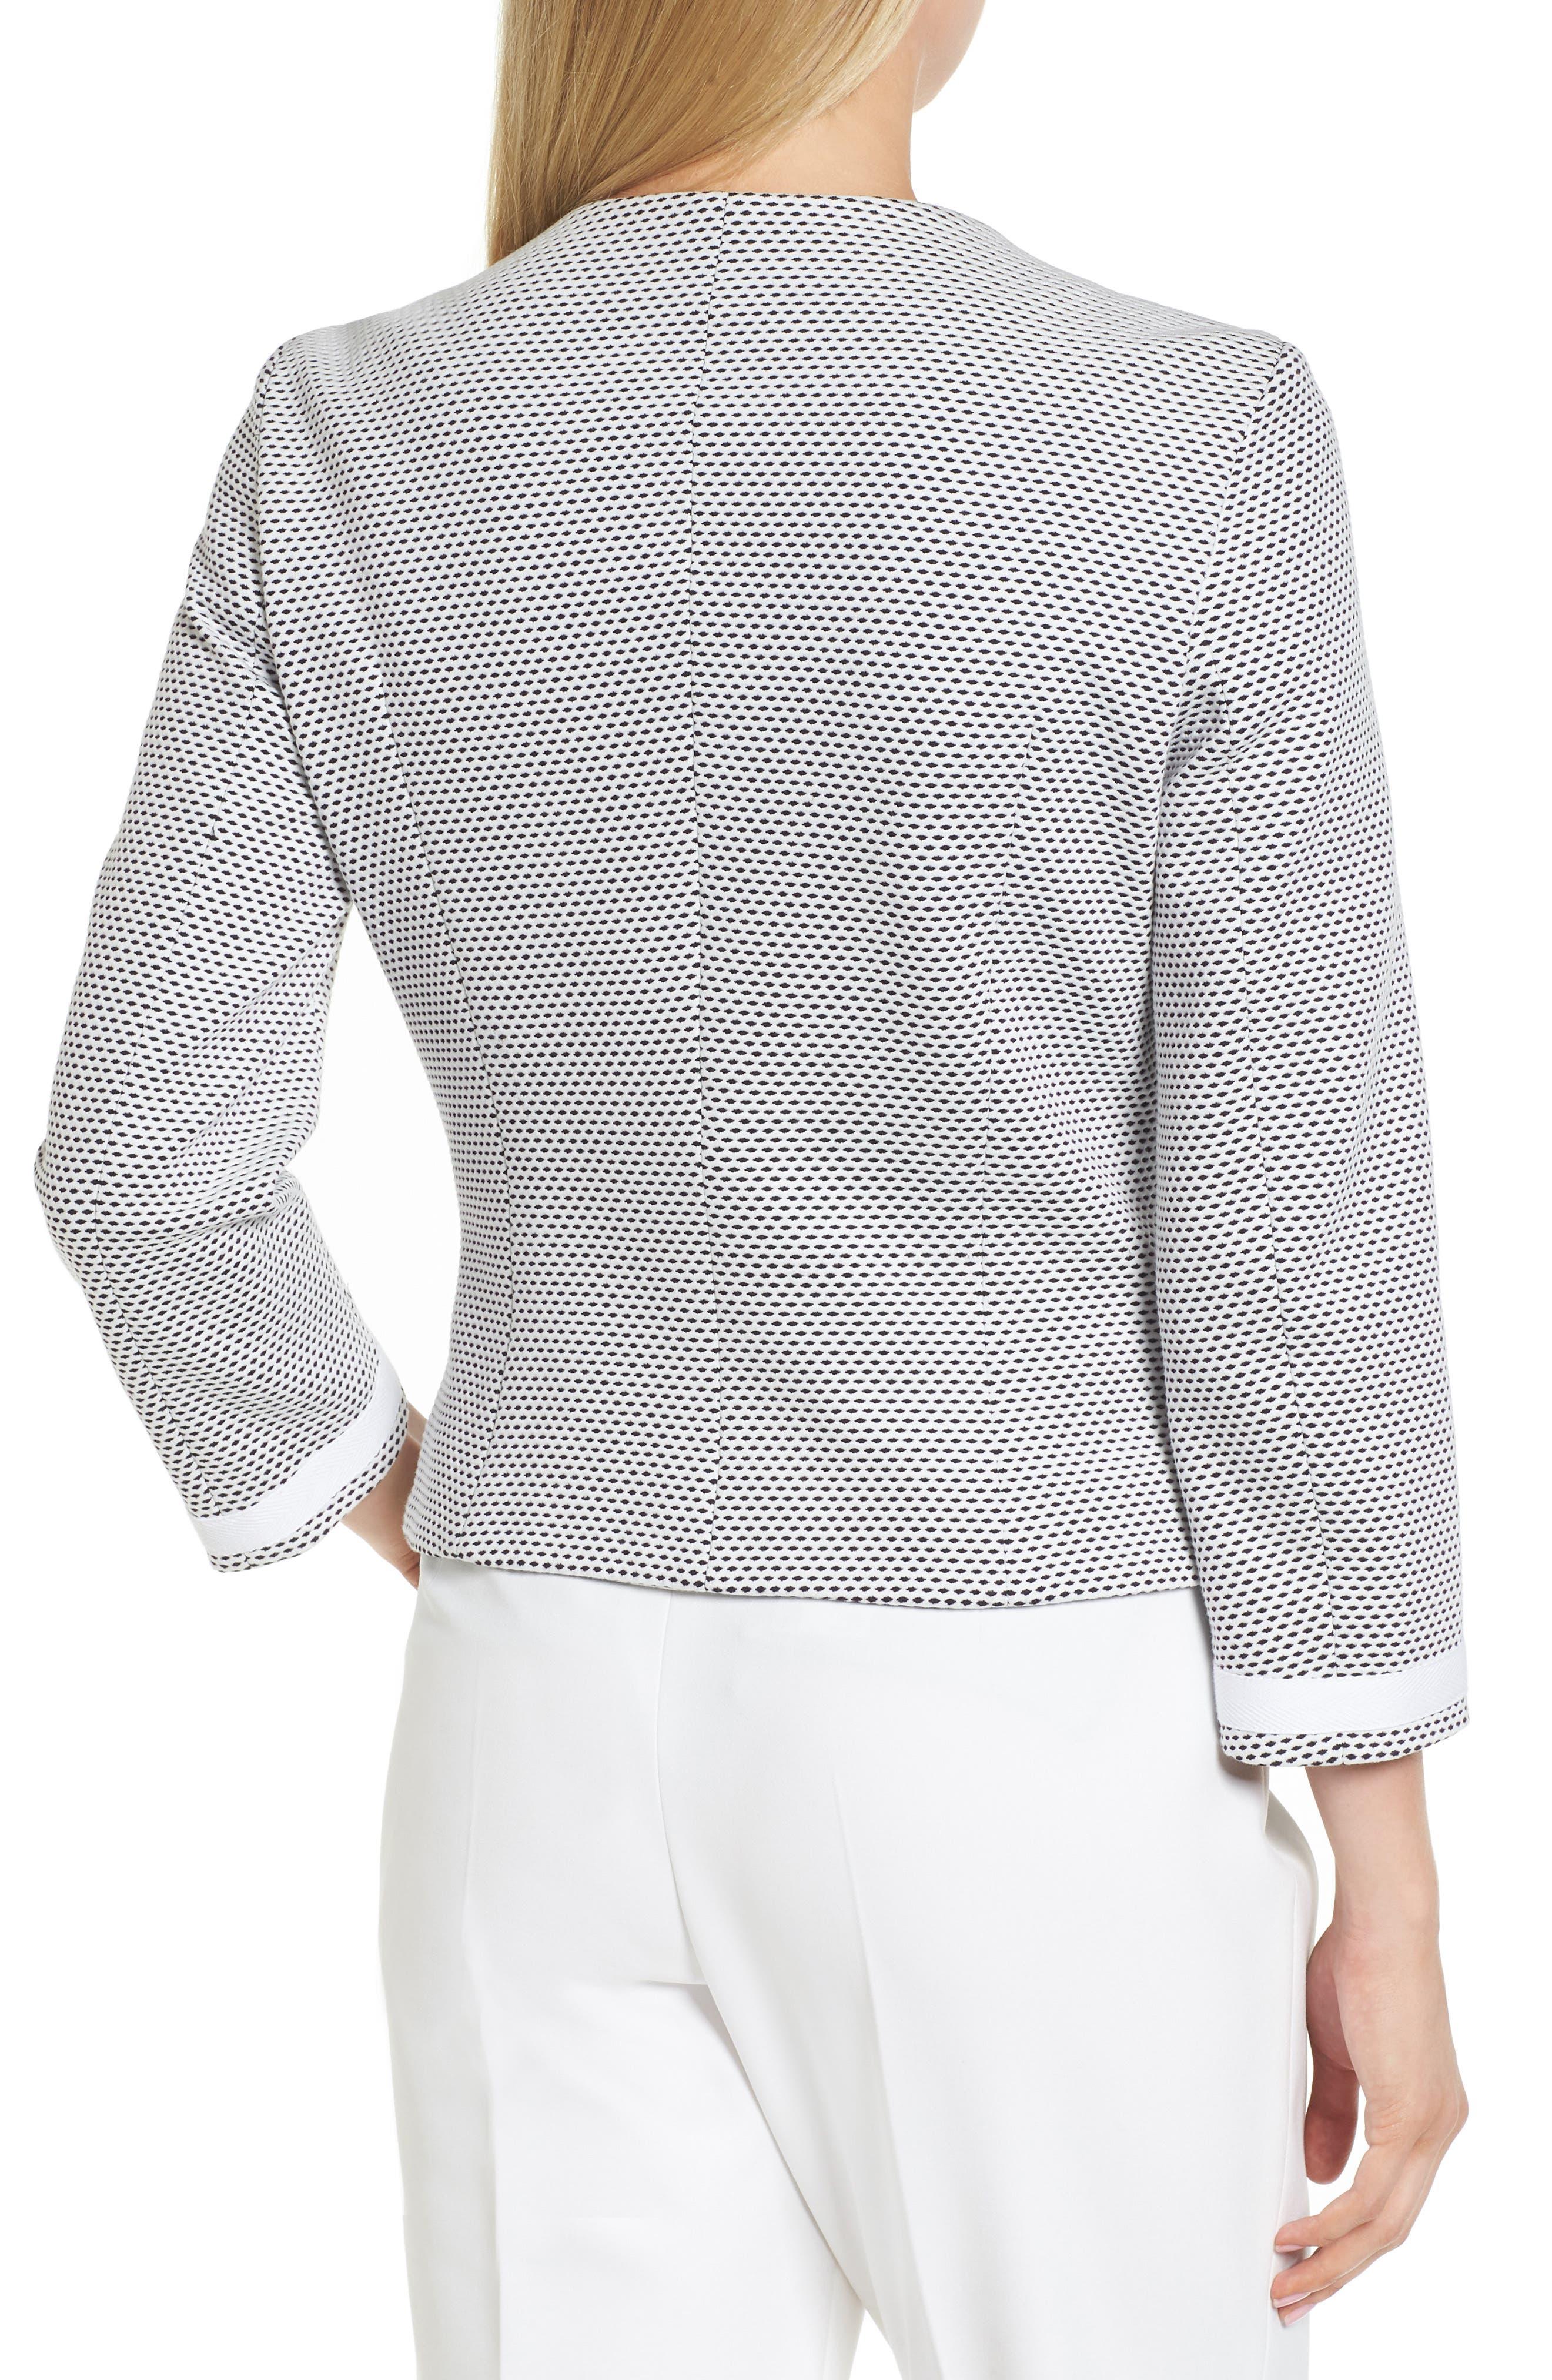 Kaily Cotton Jacquard Crop Jacket,                             Alternate thumbnail 2, color,                             170